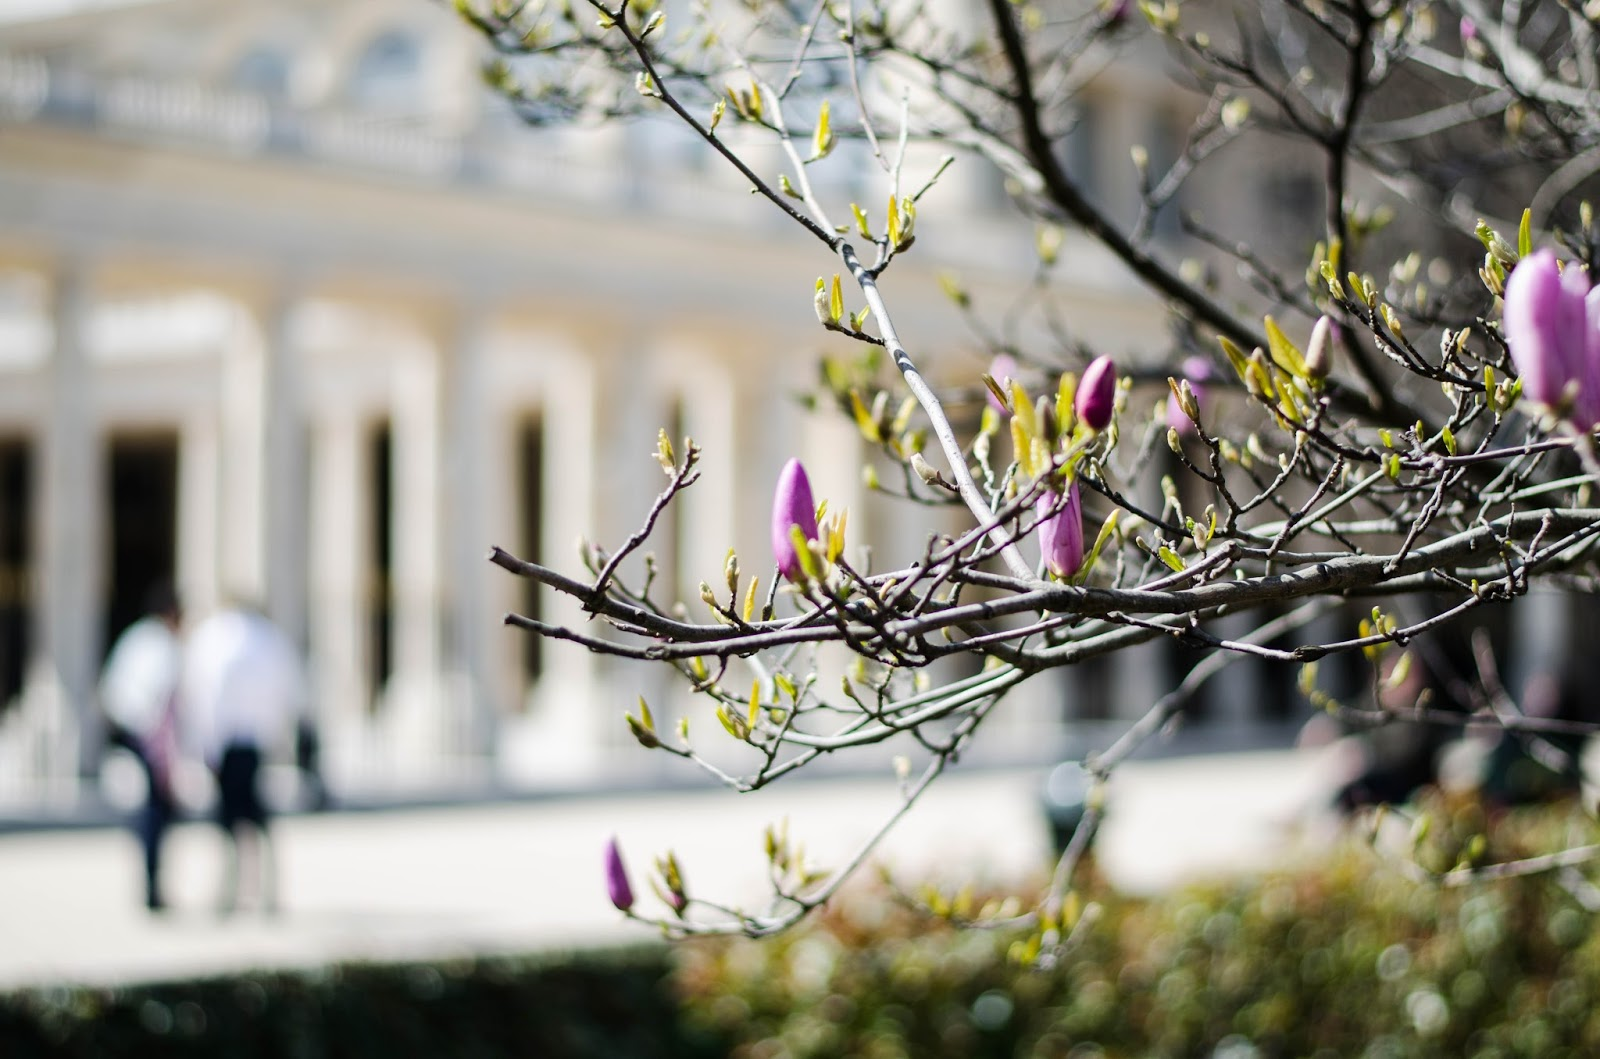 paris jardin du royal palais spring blossom